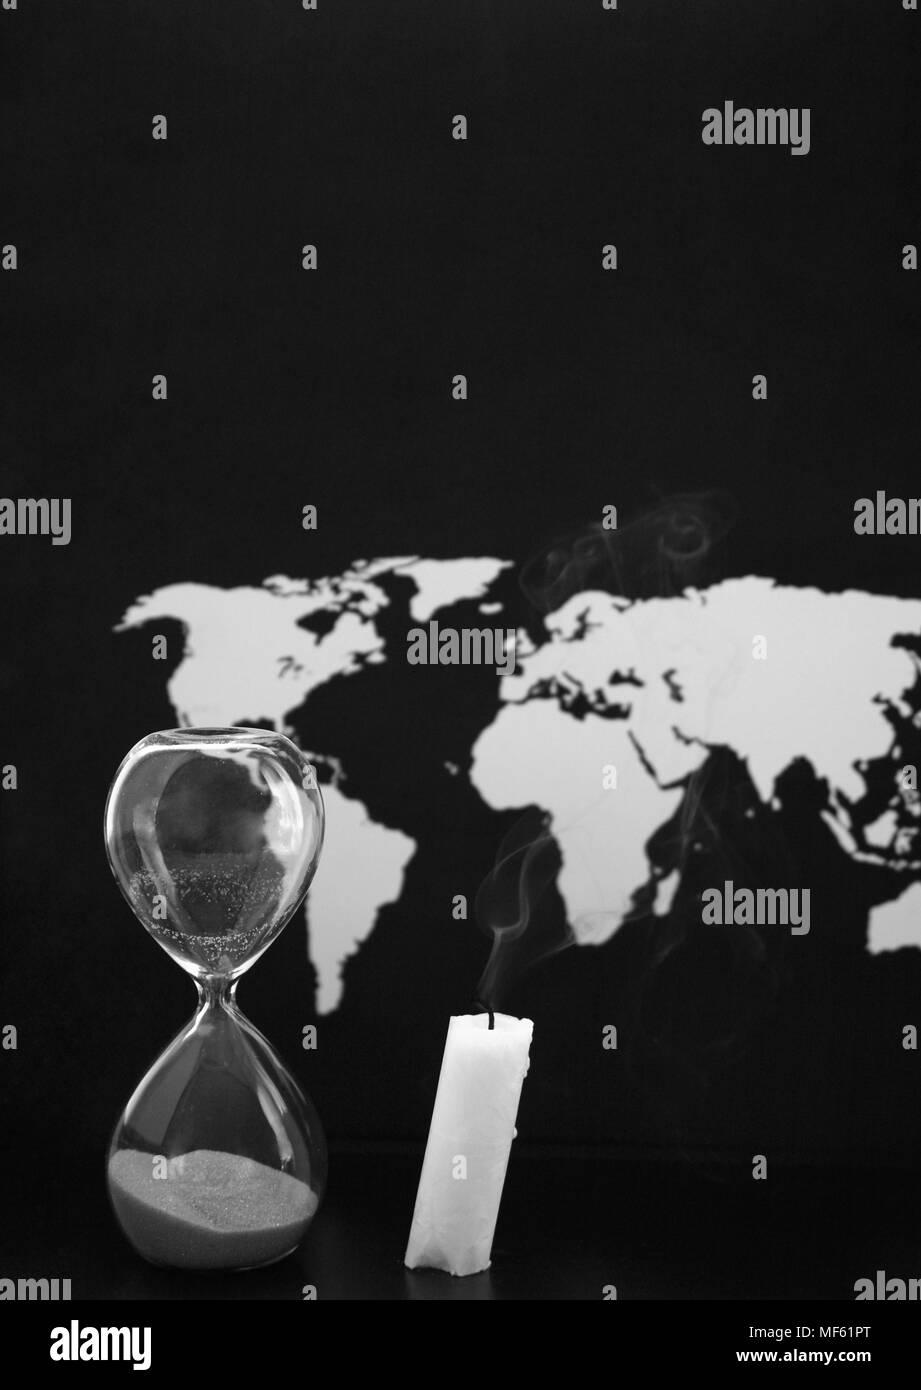 Monochrome image, world map, sandglass and burnt candle, black background - Stock Image